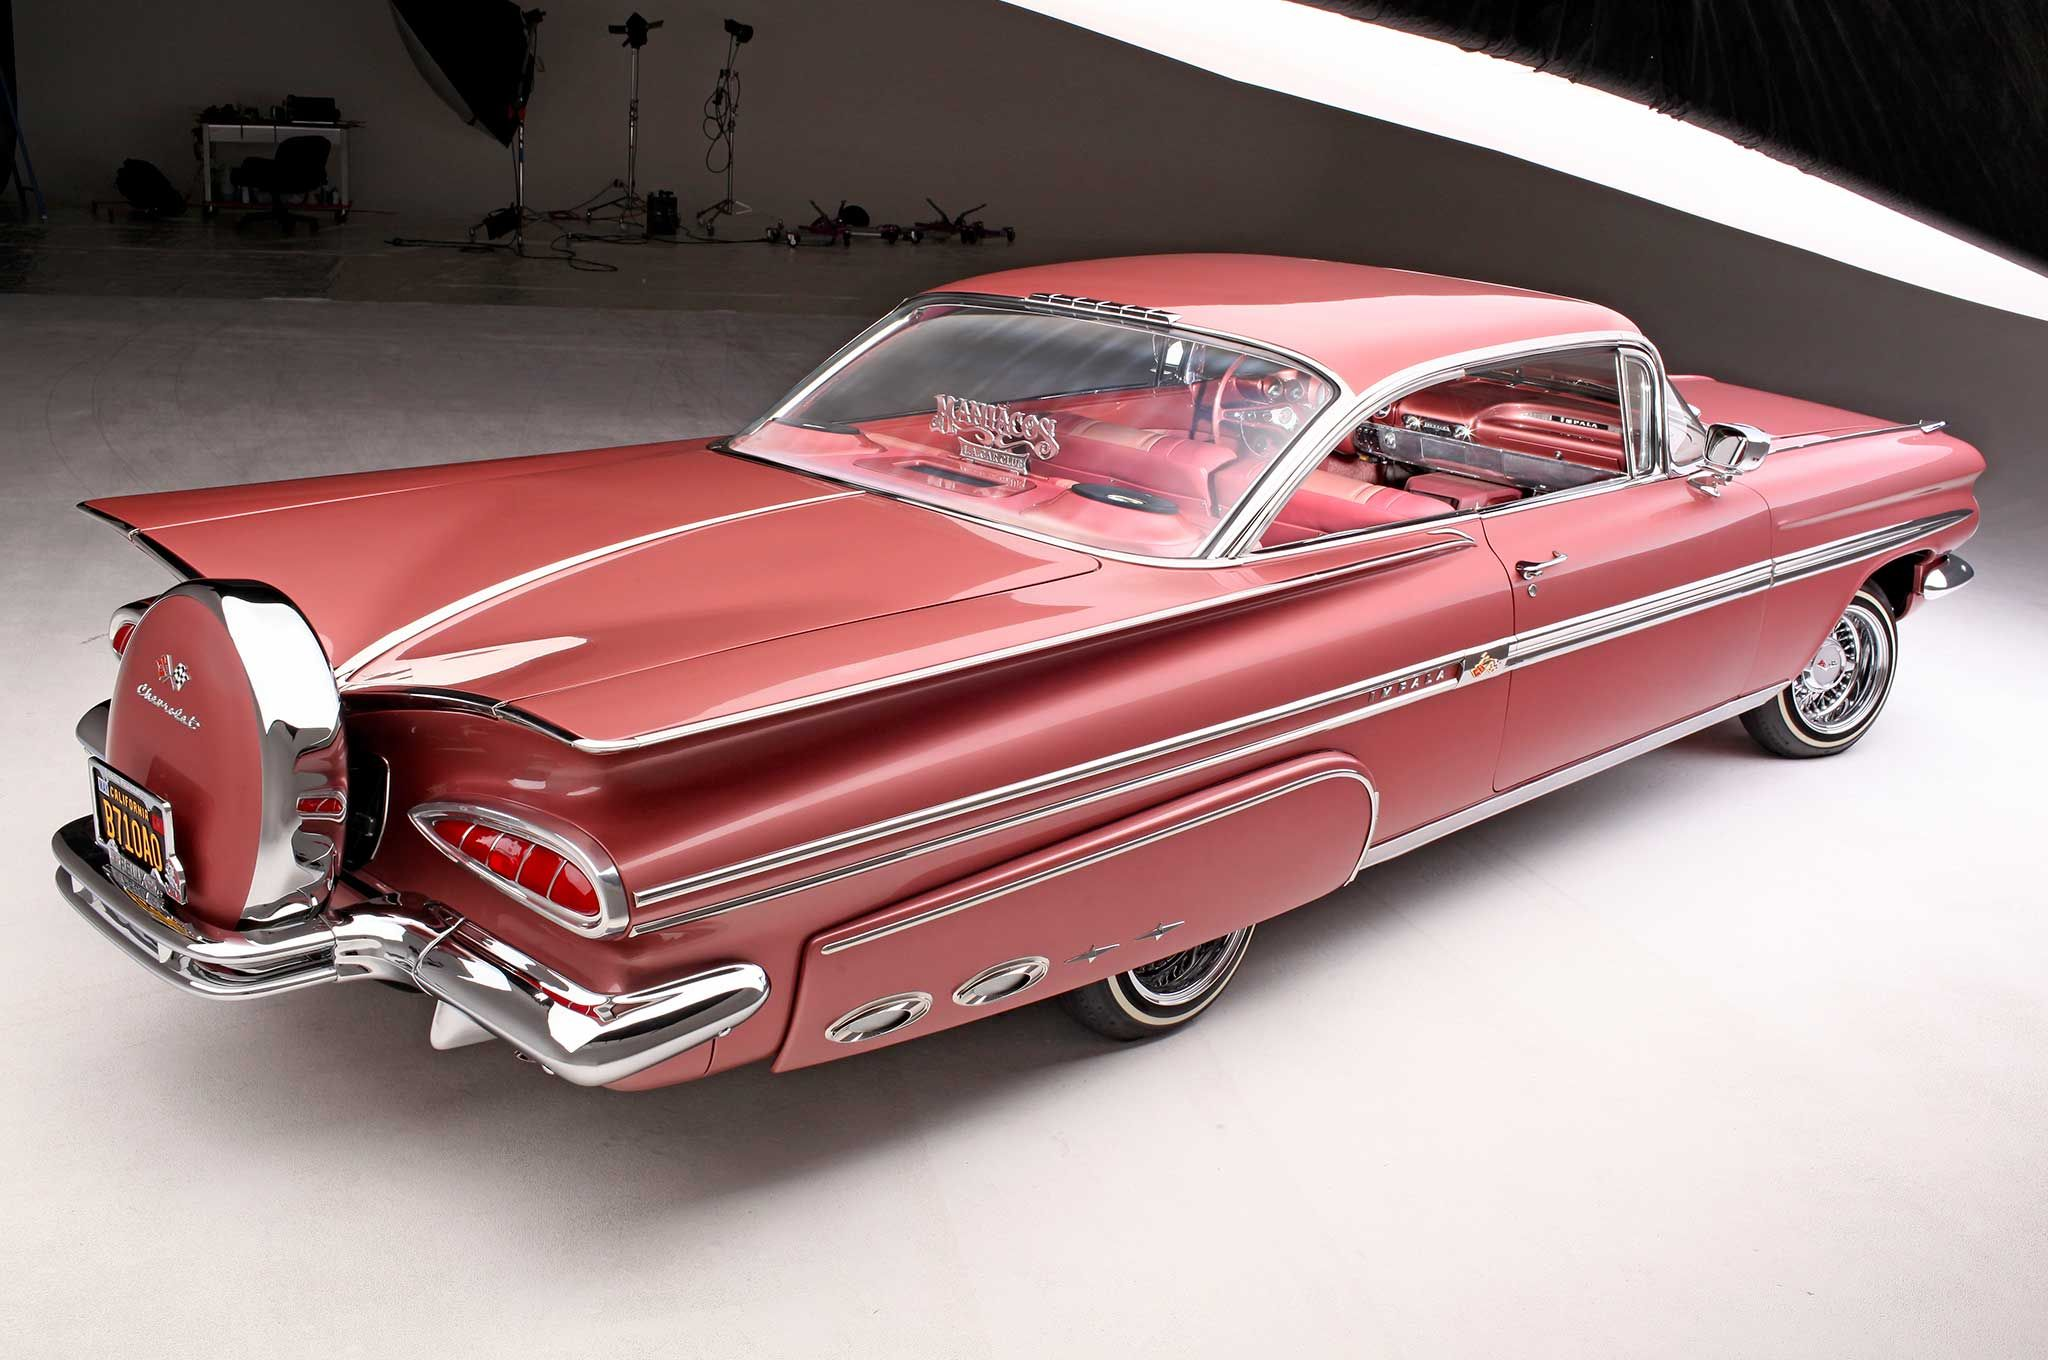 small resolution of 1959 chevrolet impala passenger side rear quarter view 014